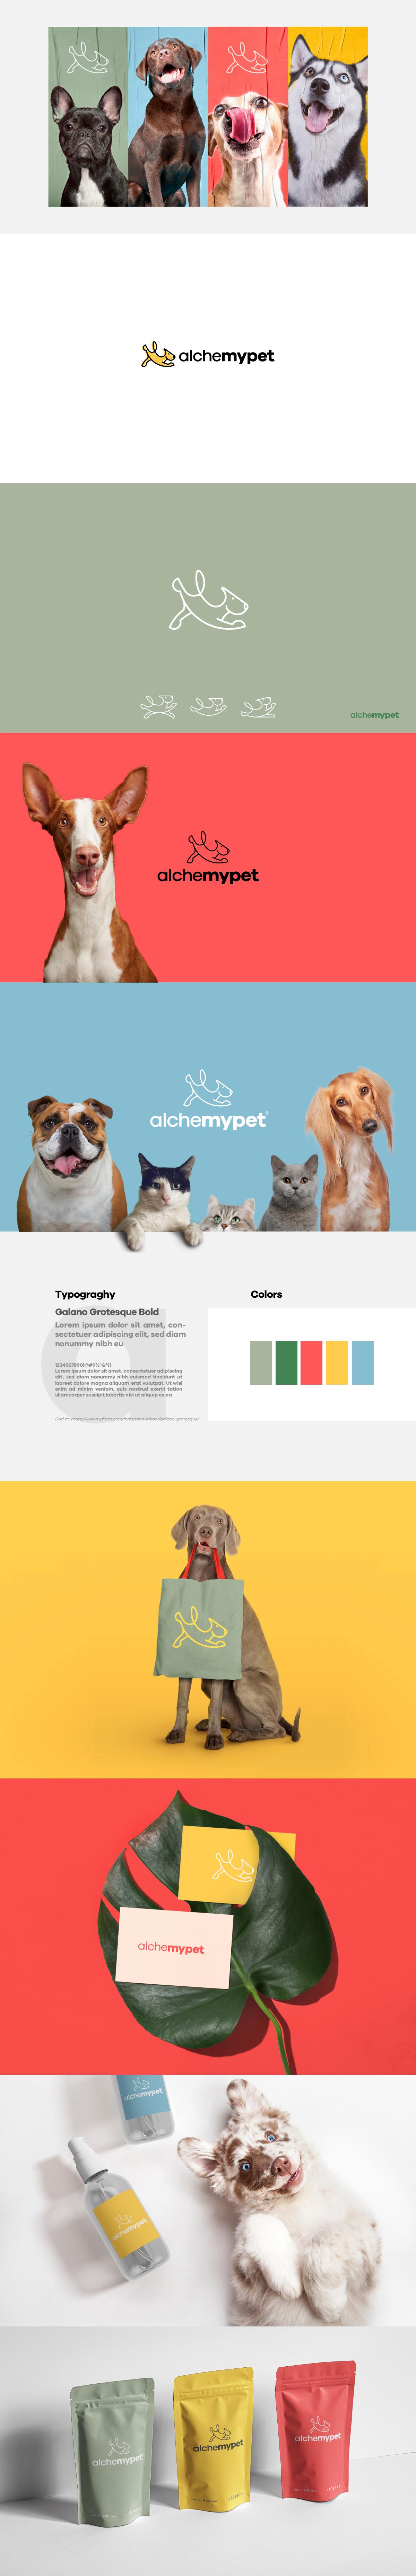 Alchemy Pet Nutraceuticals